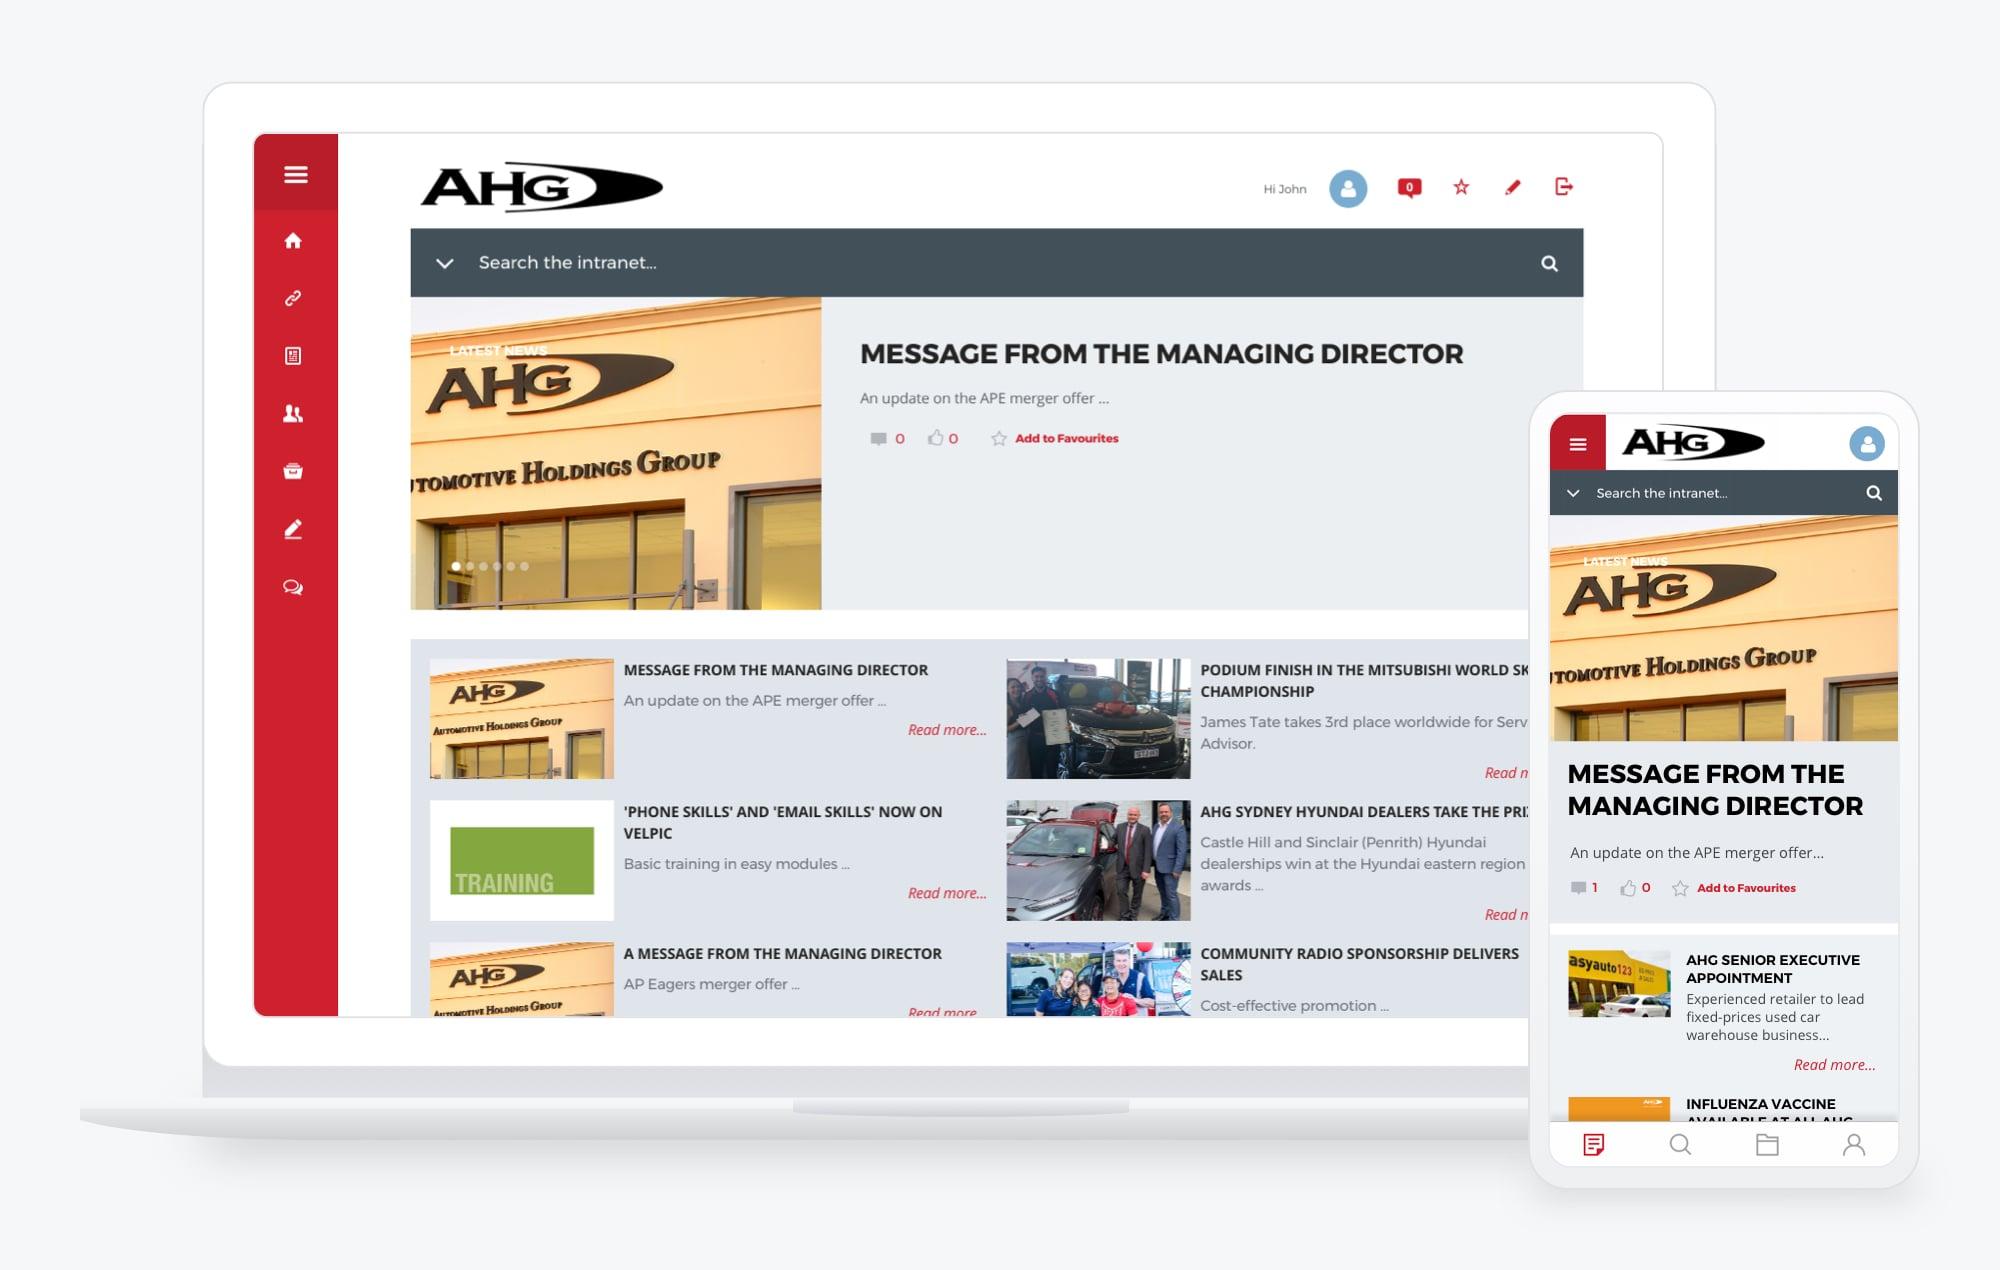 Automotive Holdings Group Ltd (ASX: AHG)